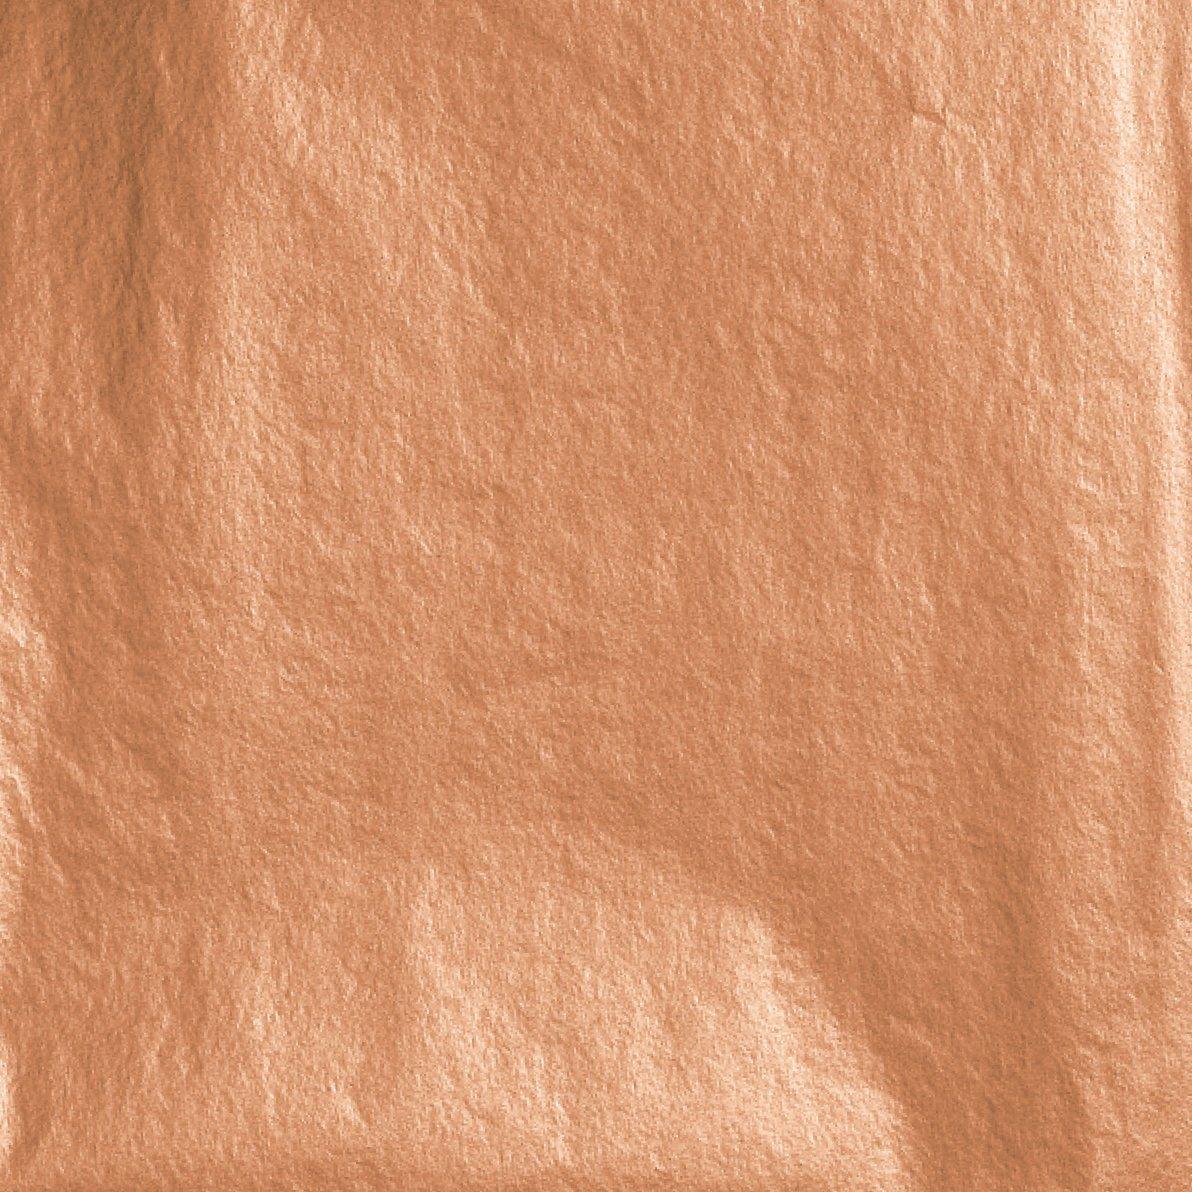 Jillson & Roberts Gift Wrap, Matte Copper (8 Rolls 5ft x 30in)